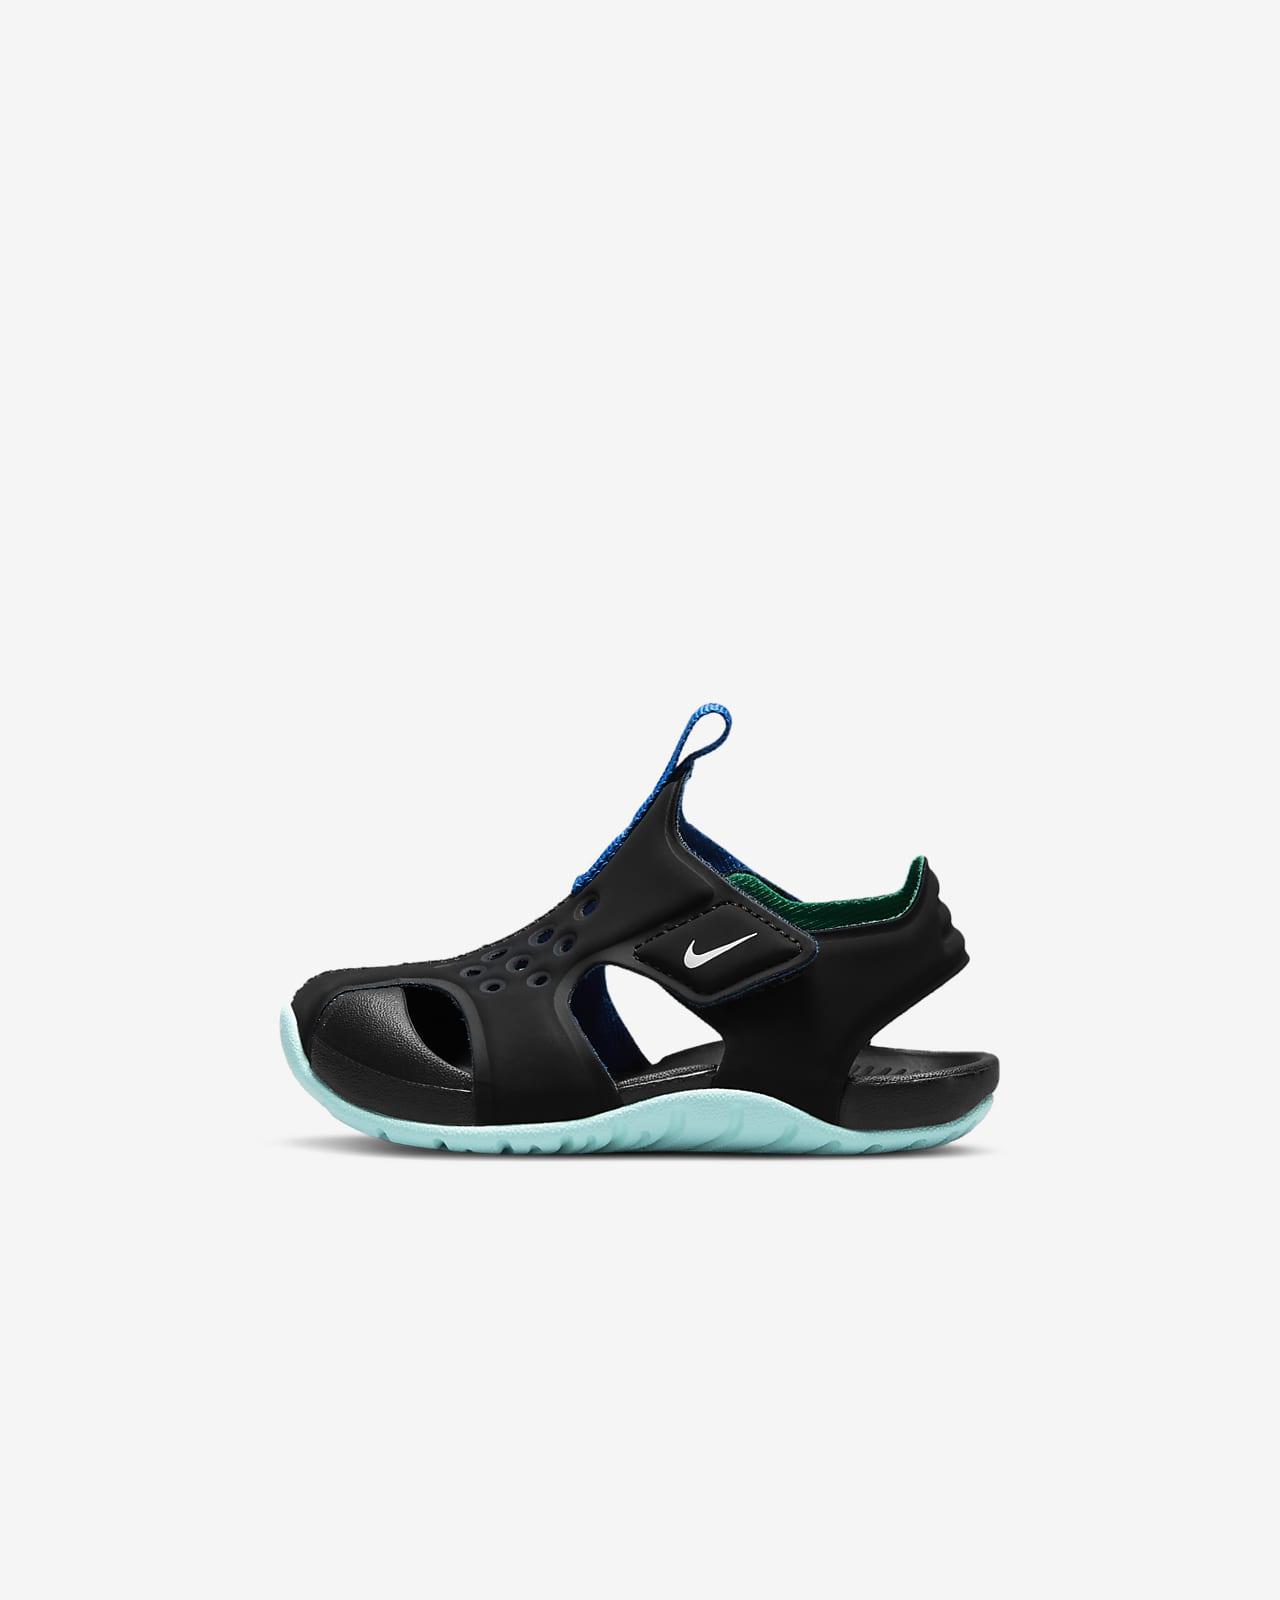 Nike Sunray Protect 2 BT 婴童凉鞋